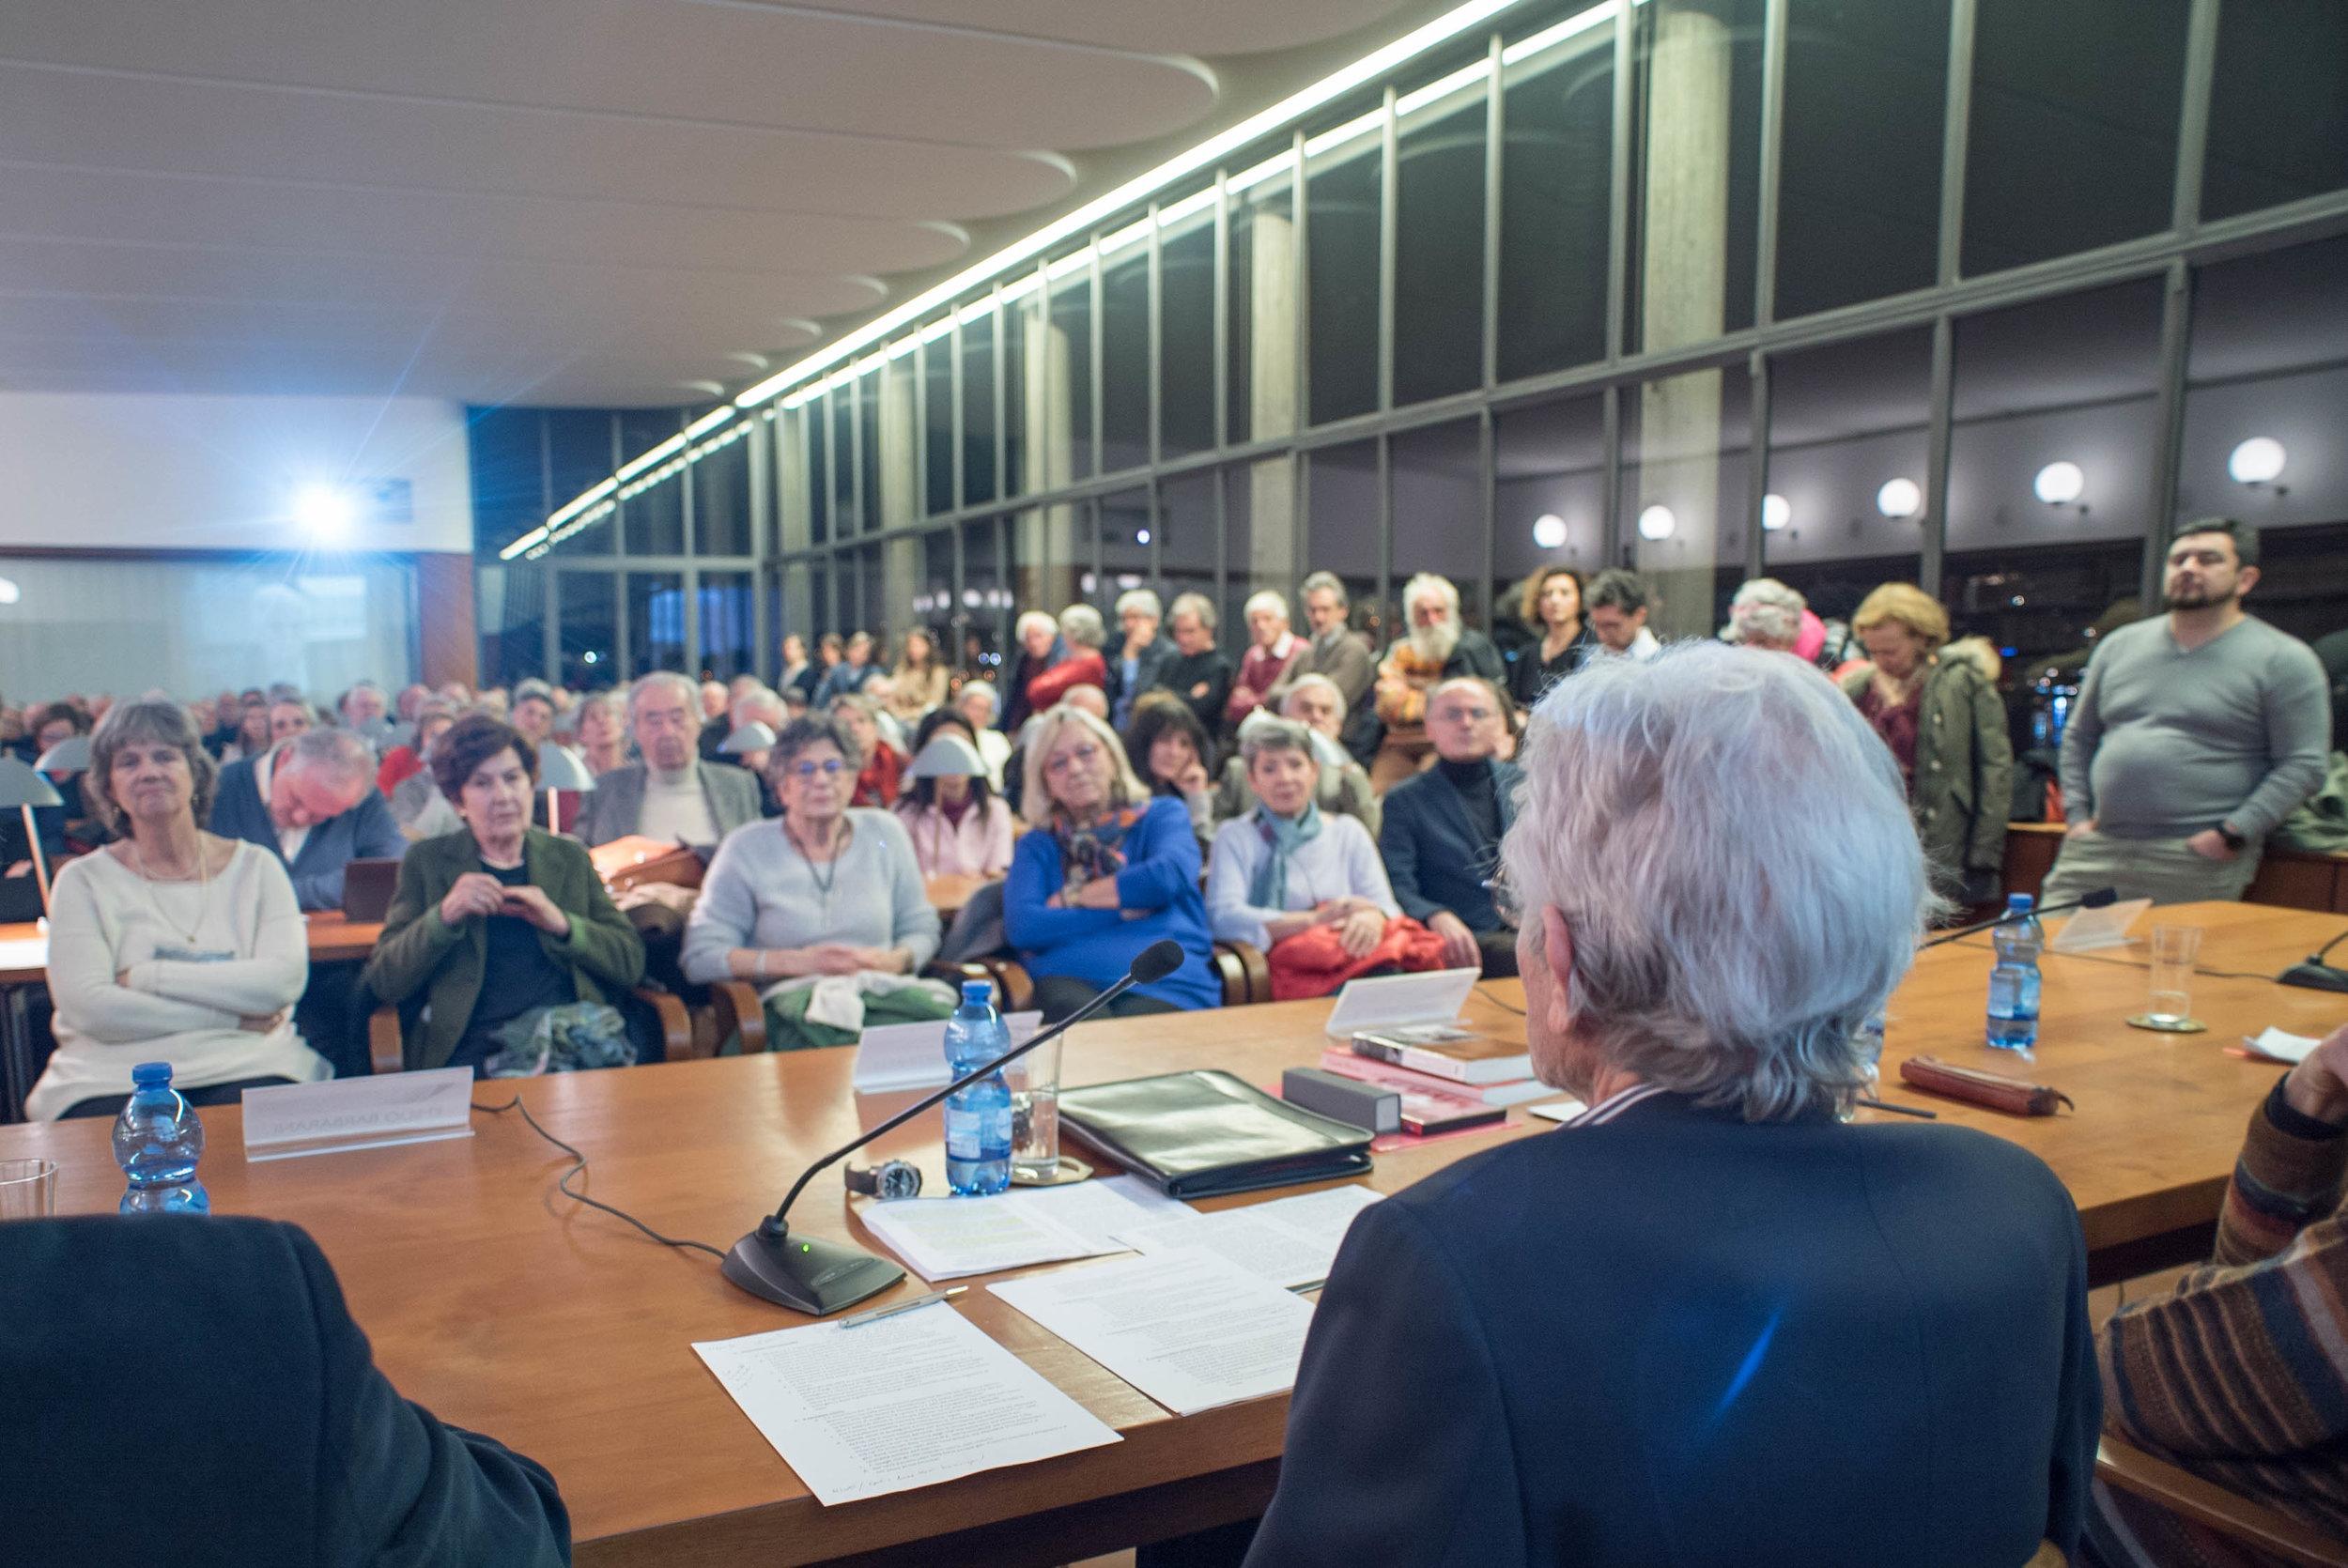 2018 02 08 Giardino dei Giusti - Guido Rivoir - Conferenza Lugano-00283.jpg